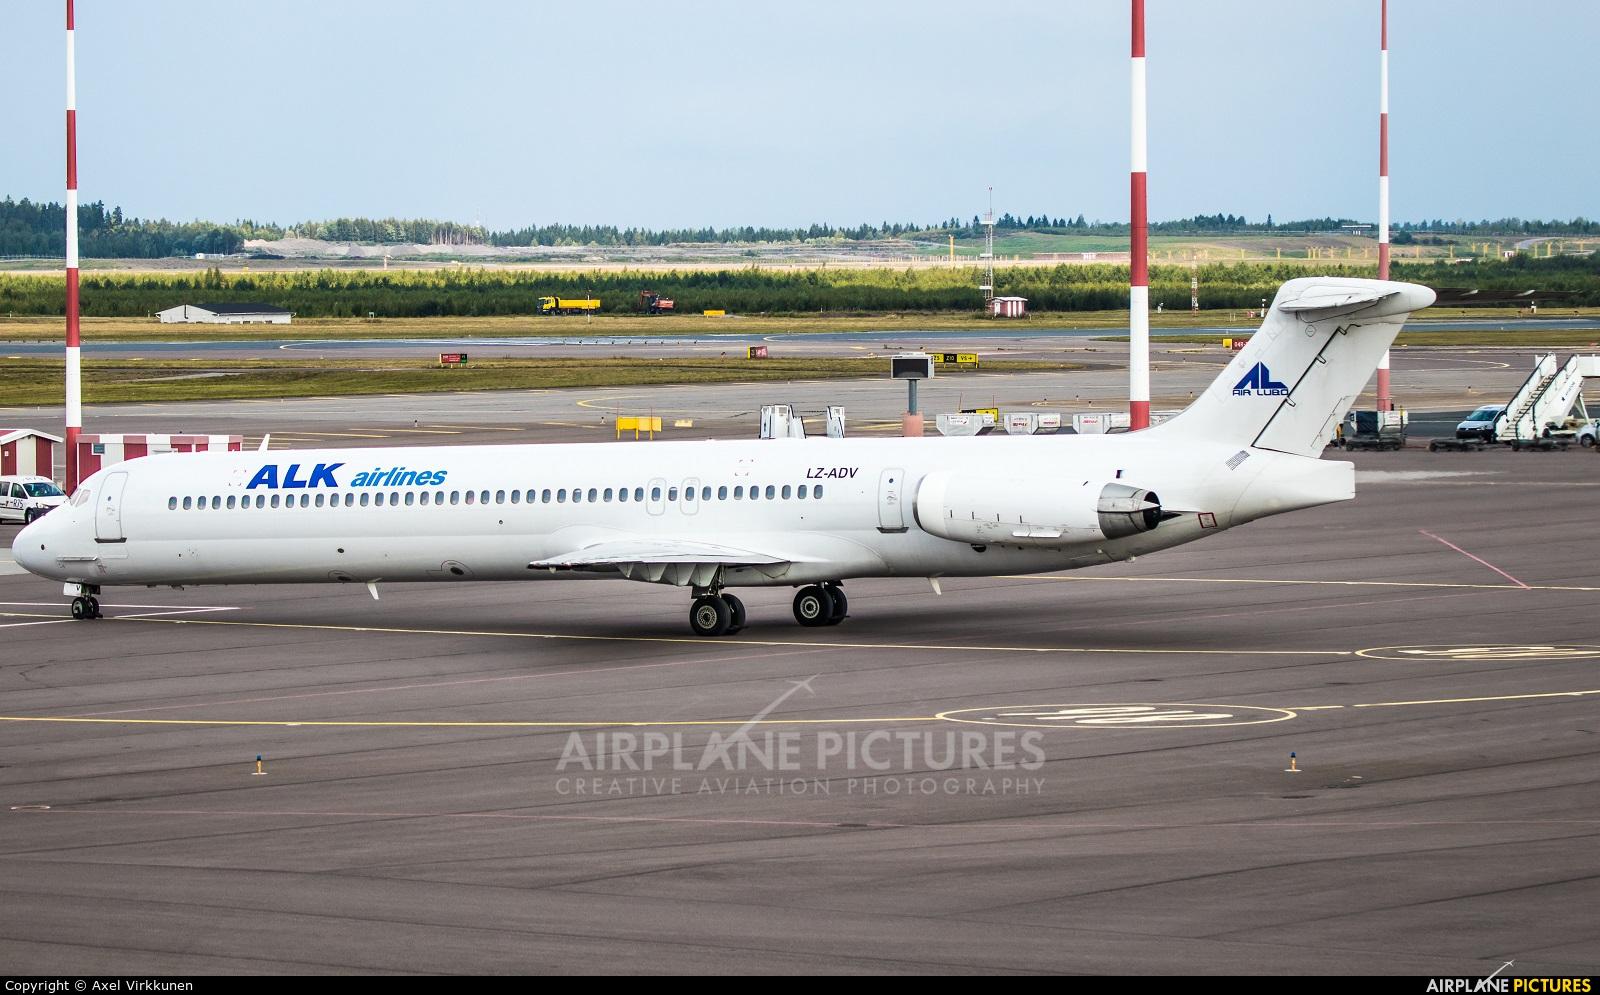 ALK Airlines LZ-ADV aircraft at Helsinki - Vantaa